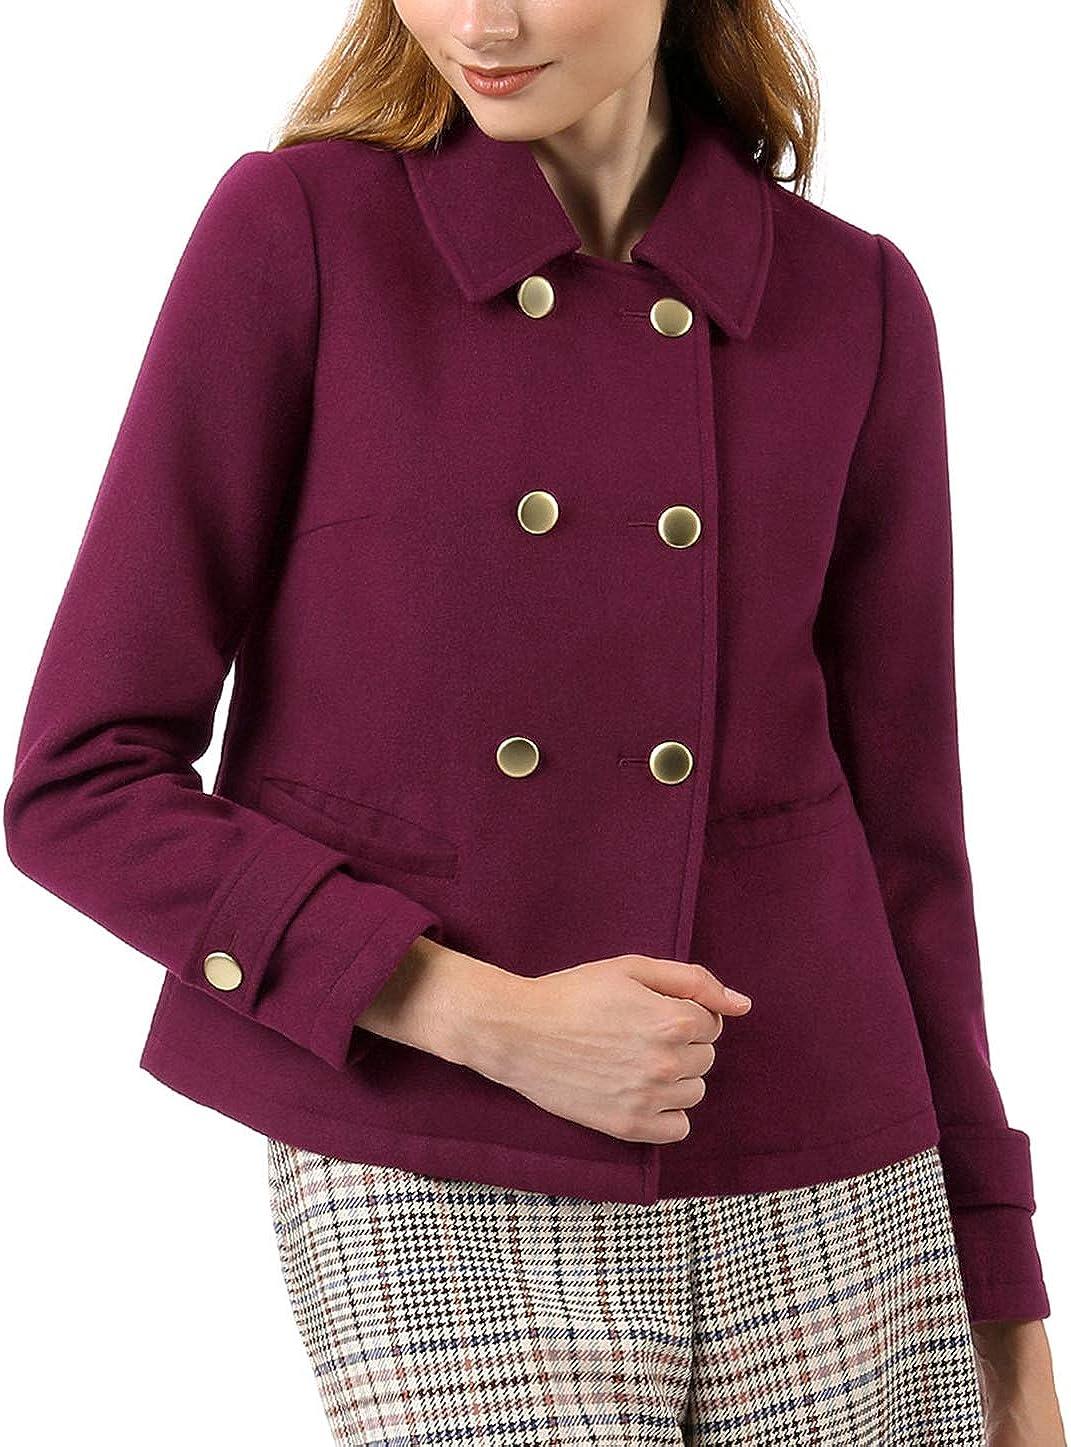 Allegra K Women's Long Sleeve Double Breasted Button Winter Outerwear Pea Coat